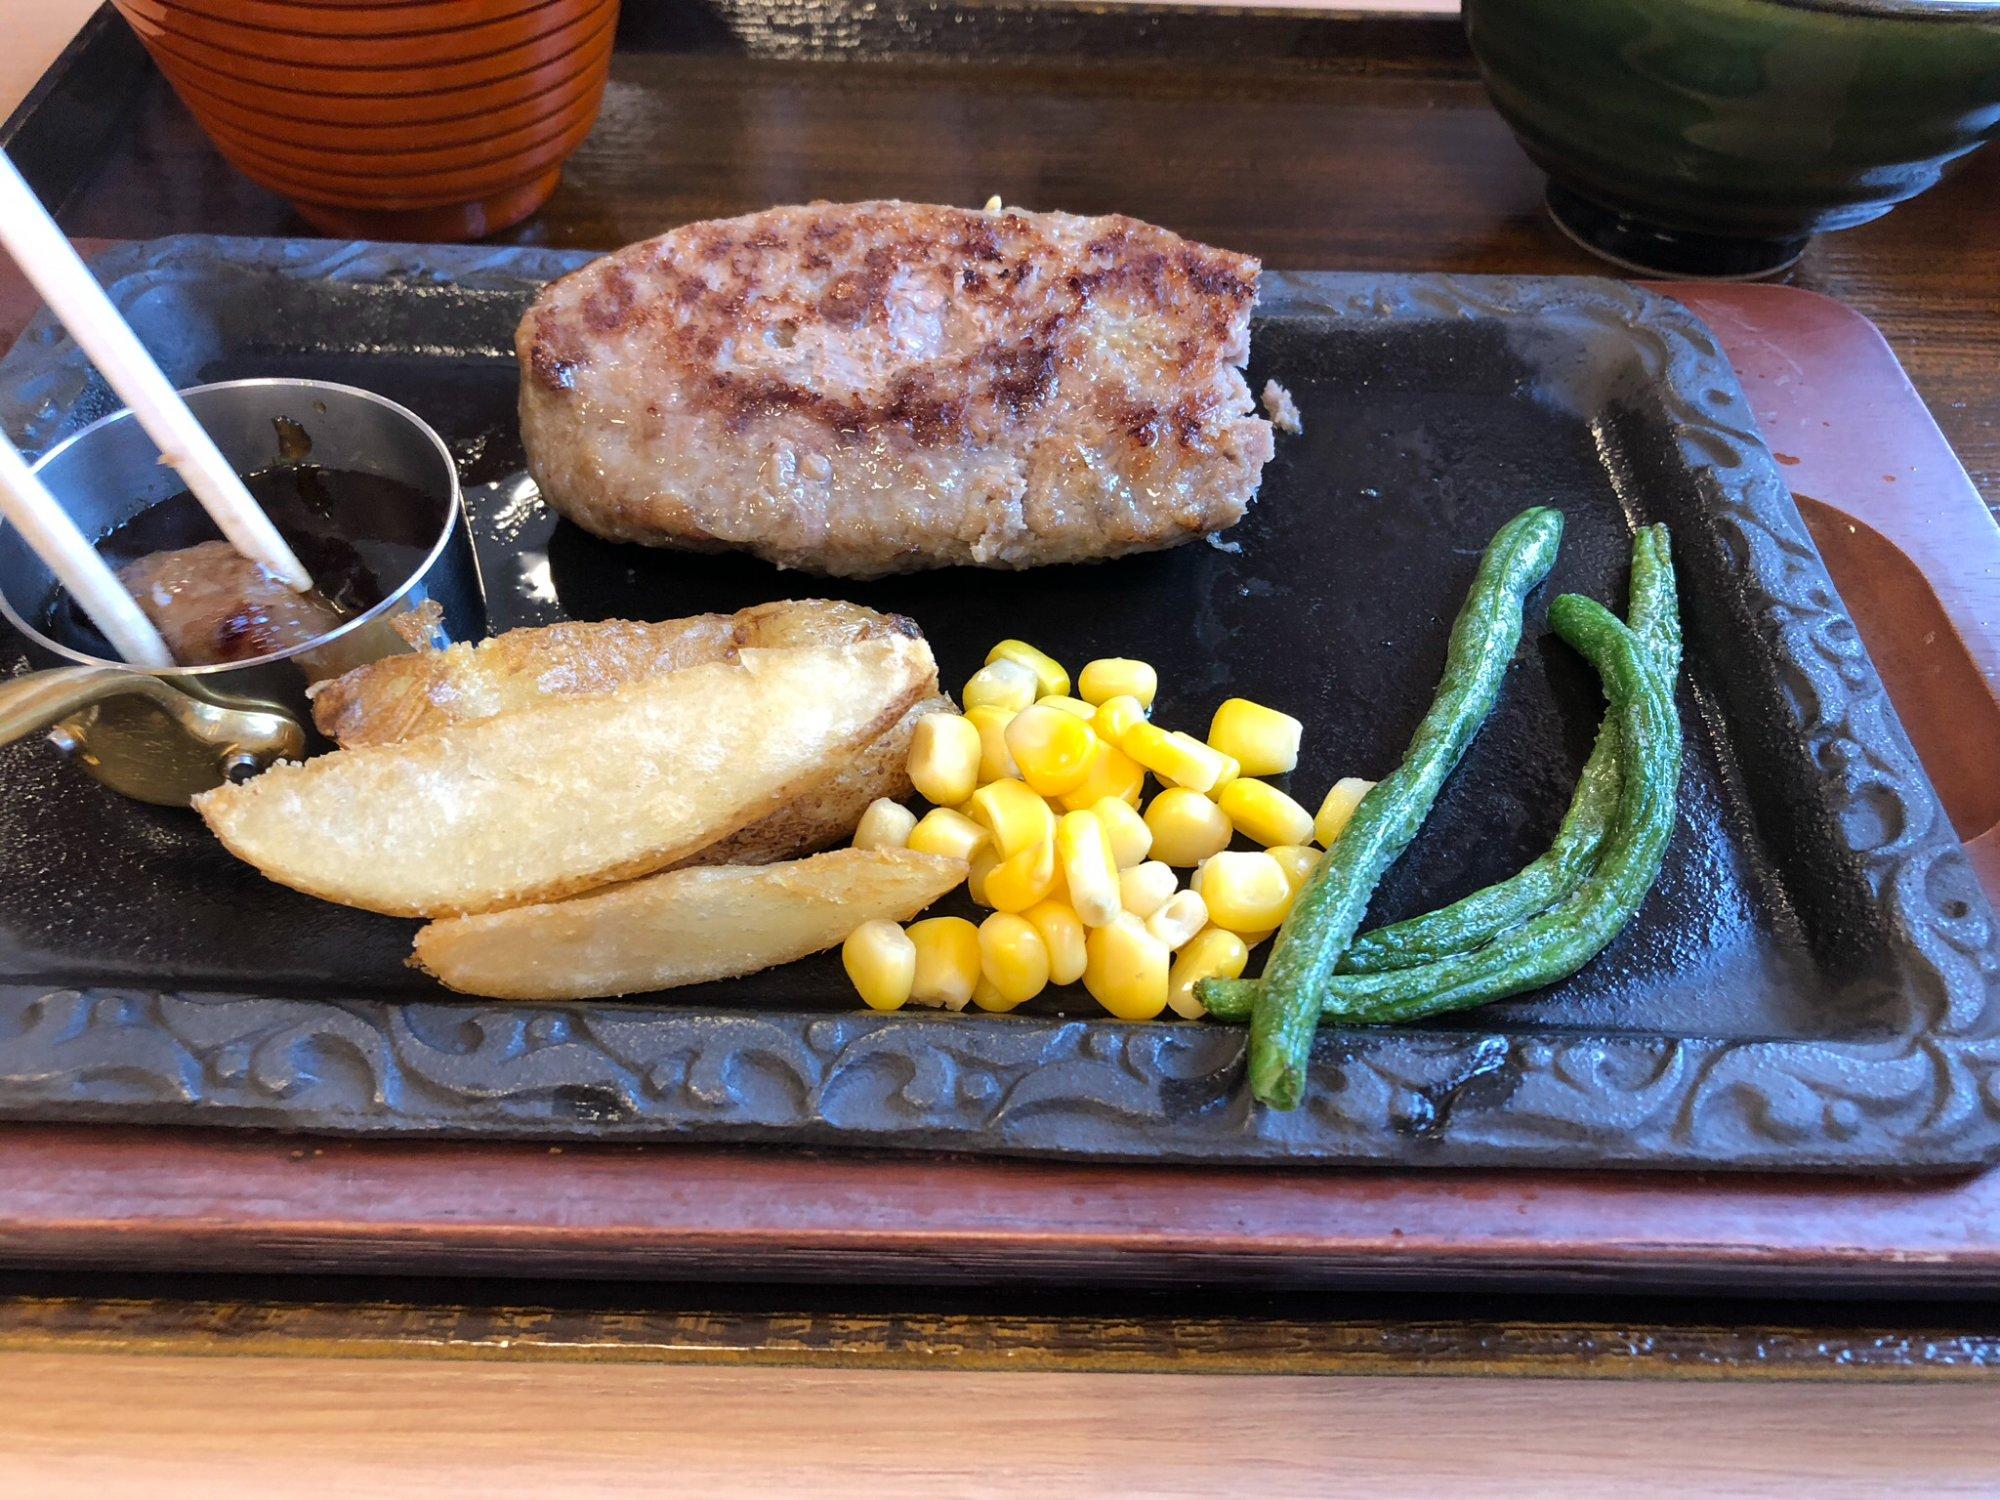 Restaurant Iwaizumi